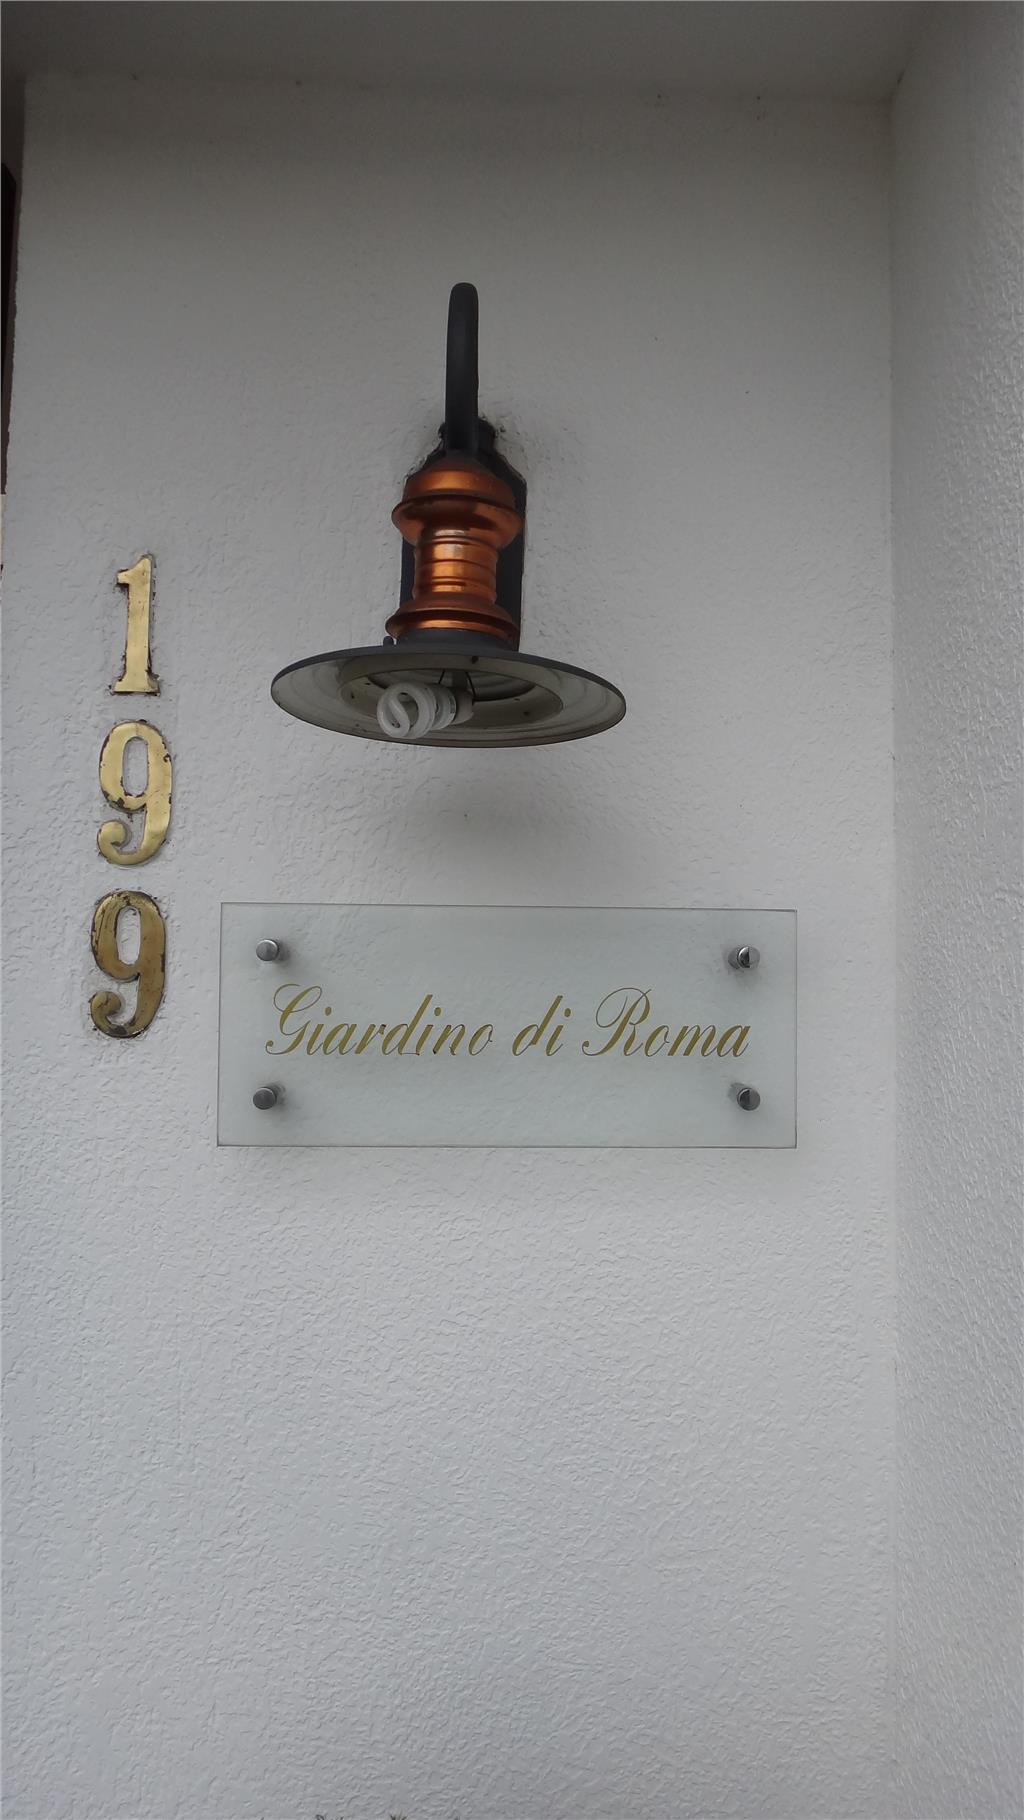 Apartamento  residencial à venda, Giardino di Roma,. Popular, Cuiabá.